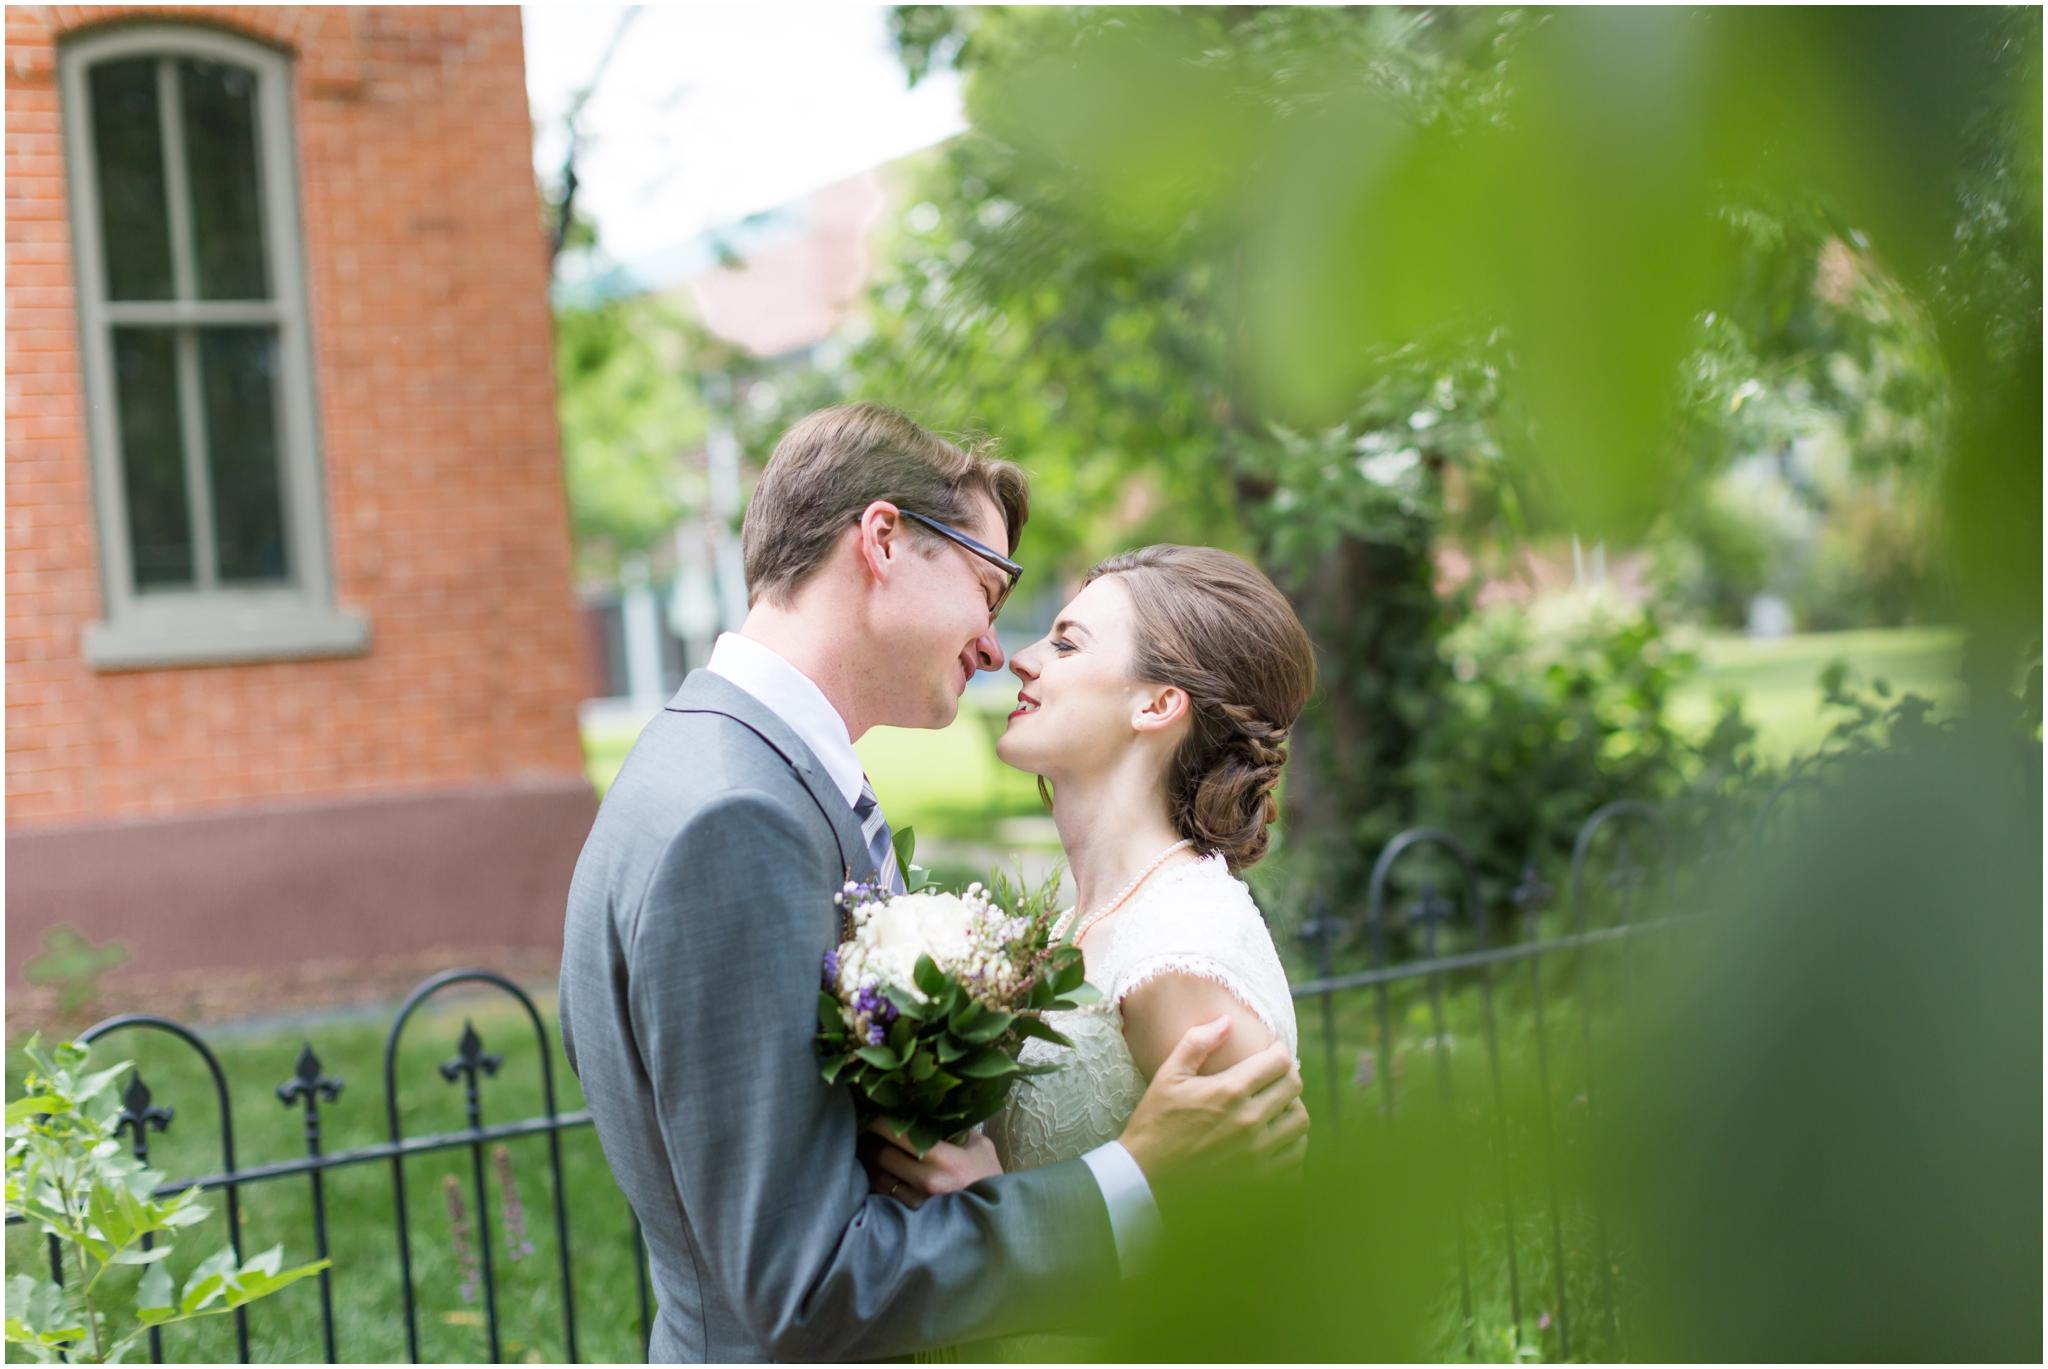 Denver Garden Wedding Photographer.jpg